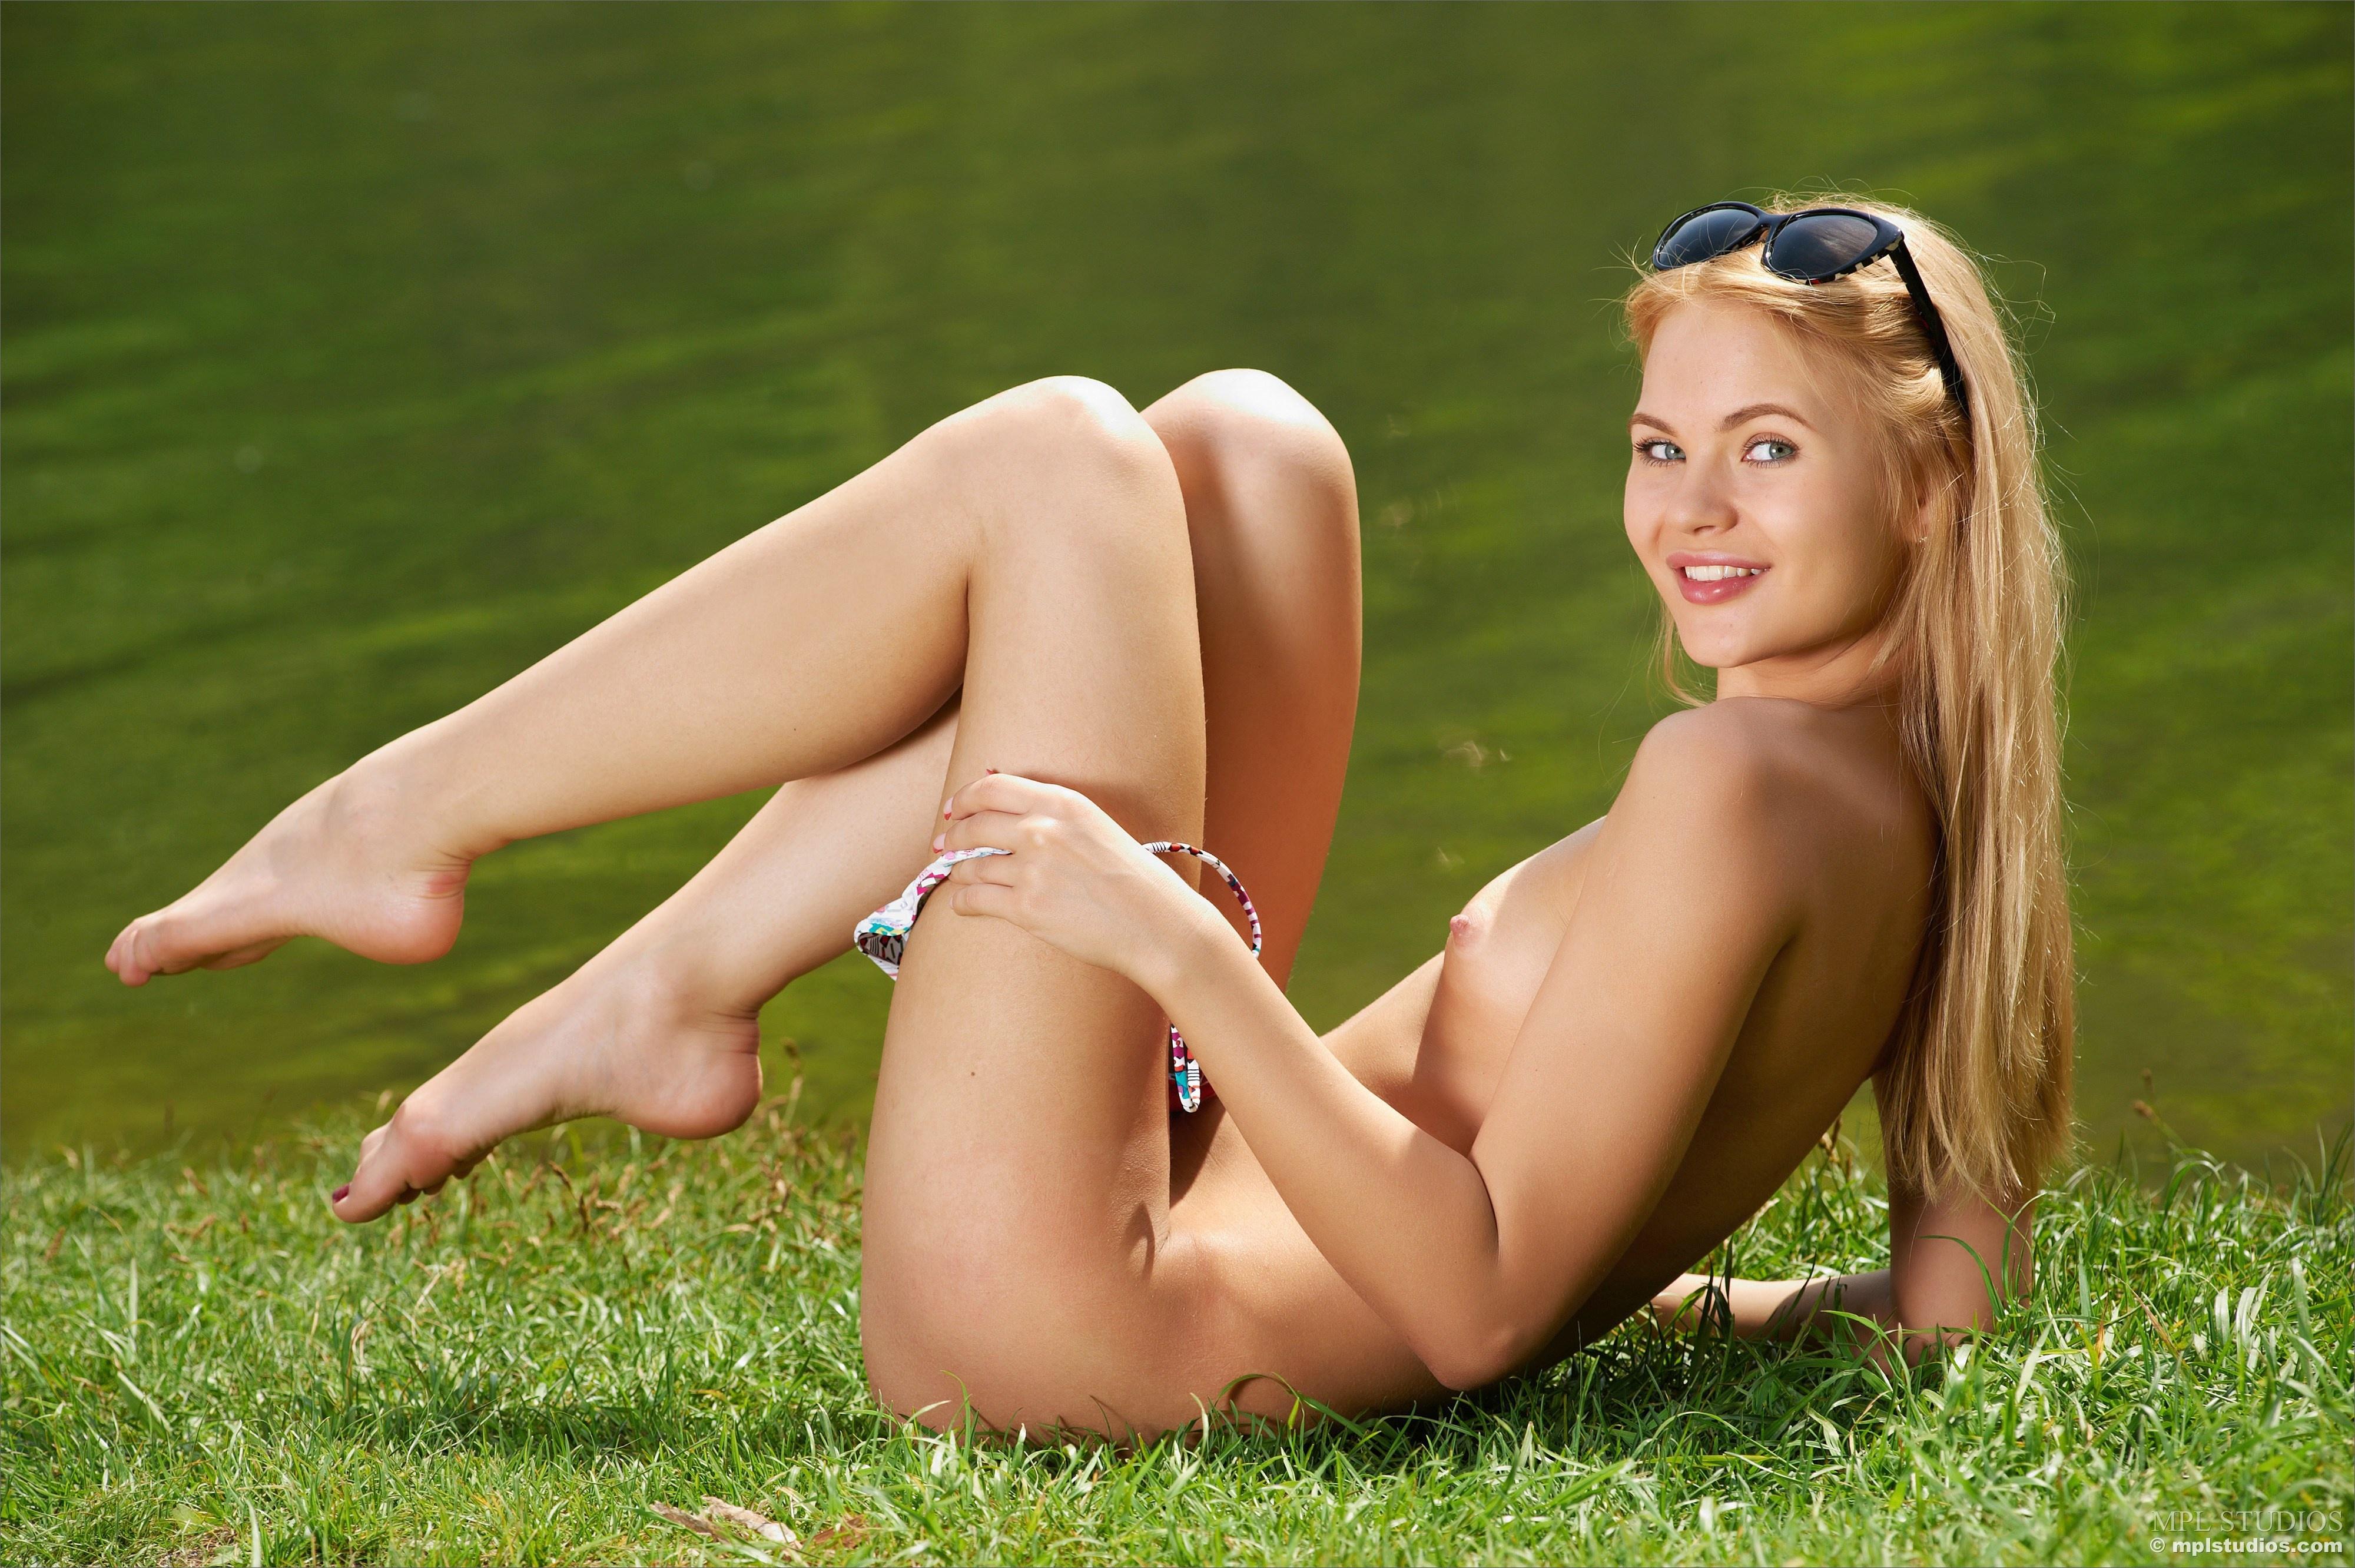 Hot blonde tiny bikini